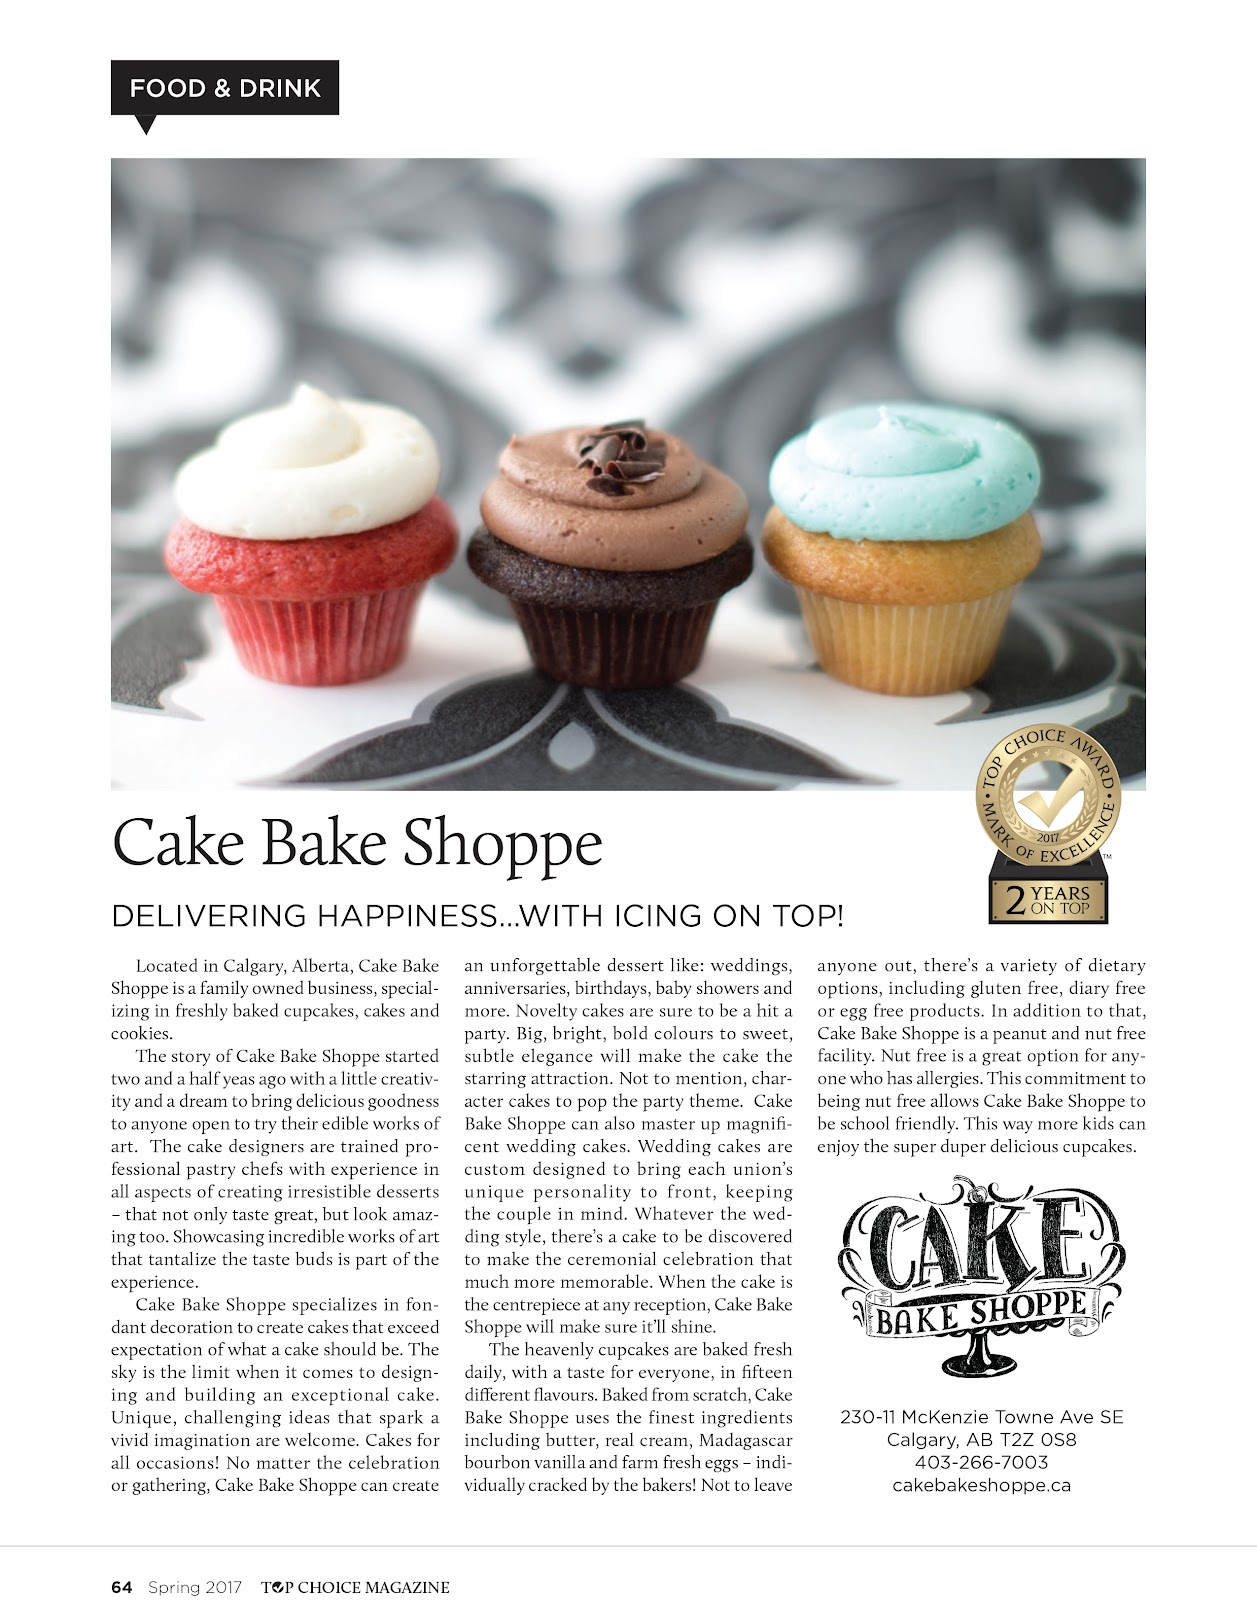 CakeBakeShoppePageSpring2017.jpg